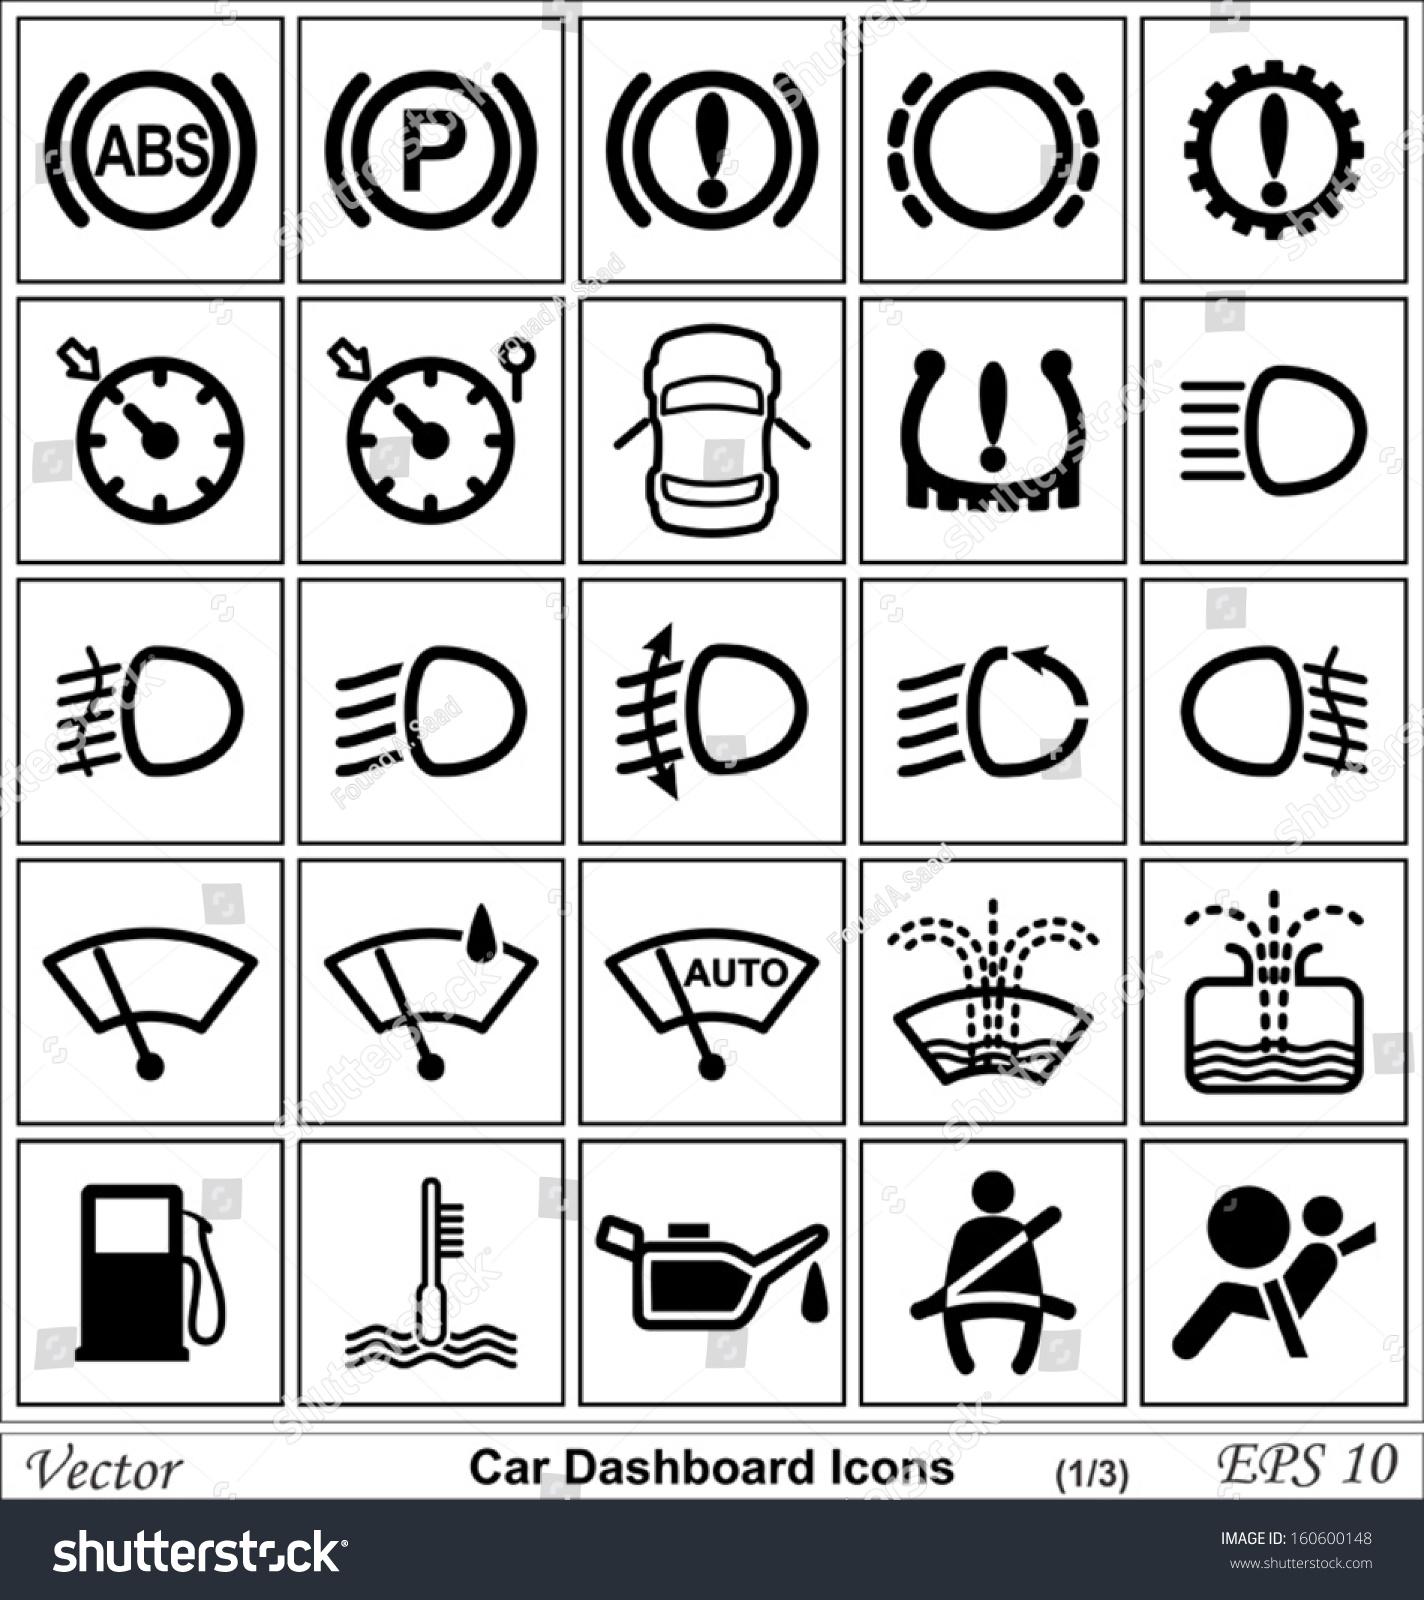 car dashboard vector icons 160600148 shutterstock